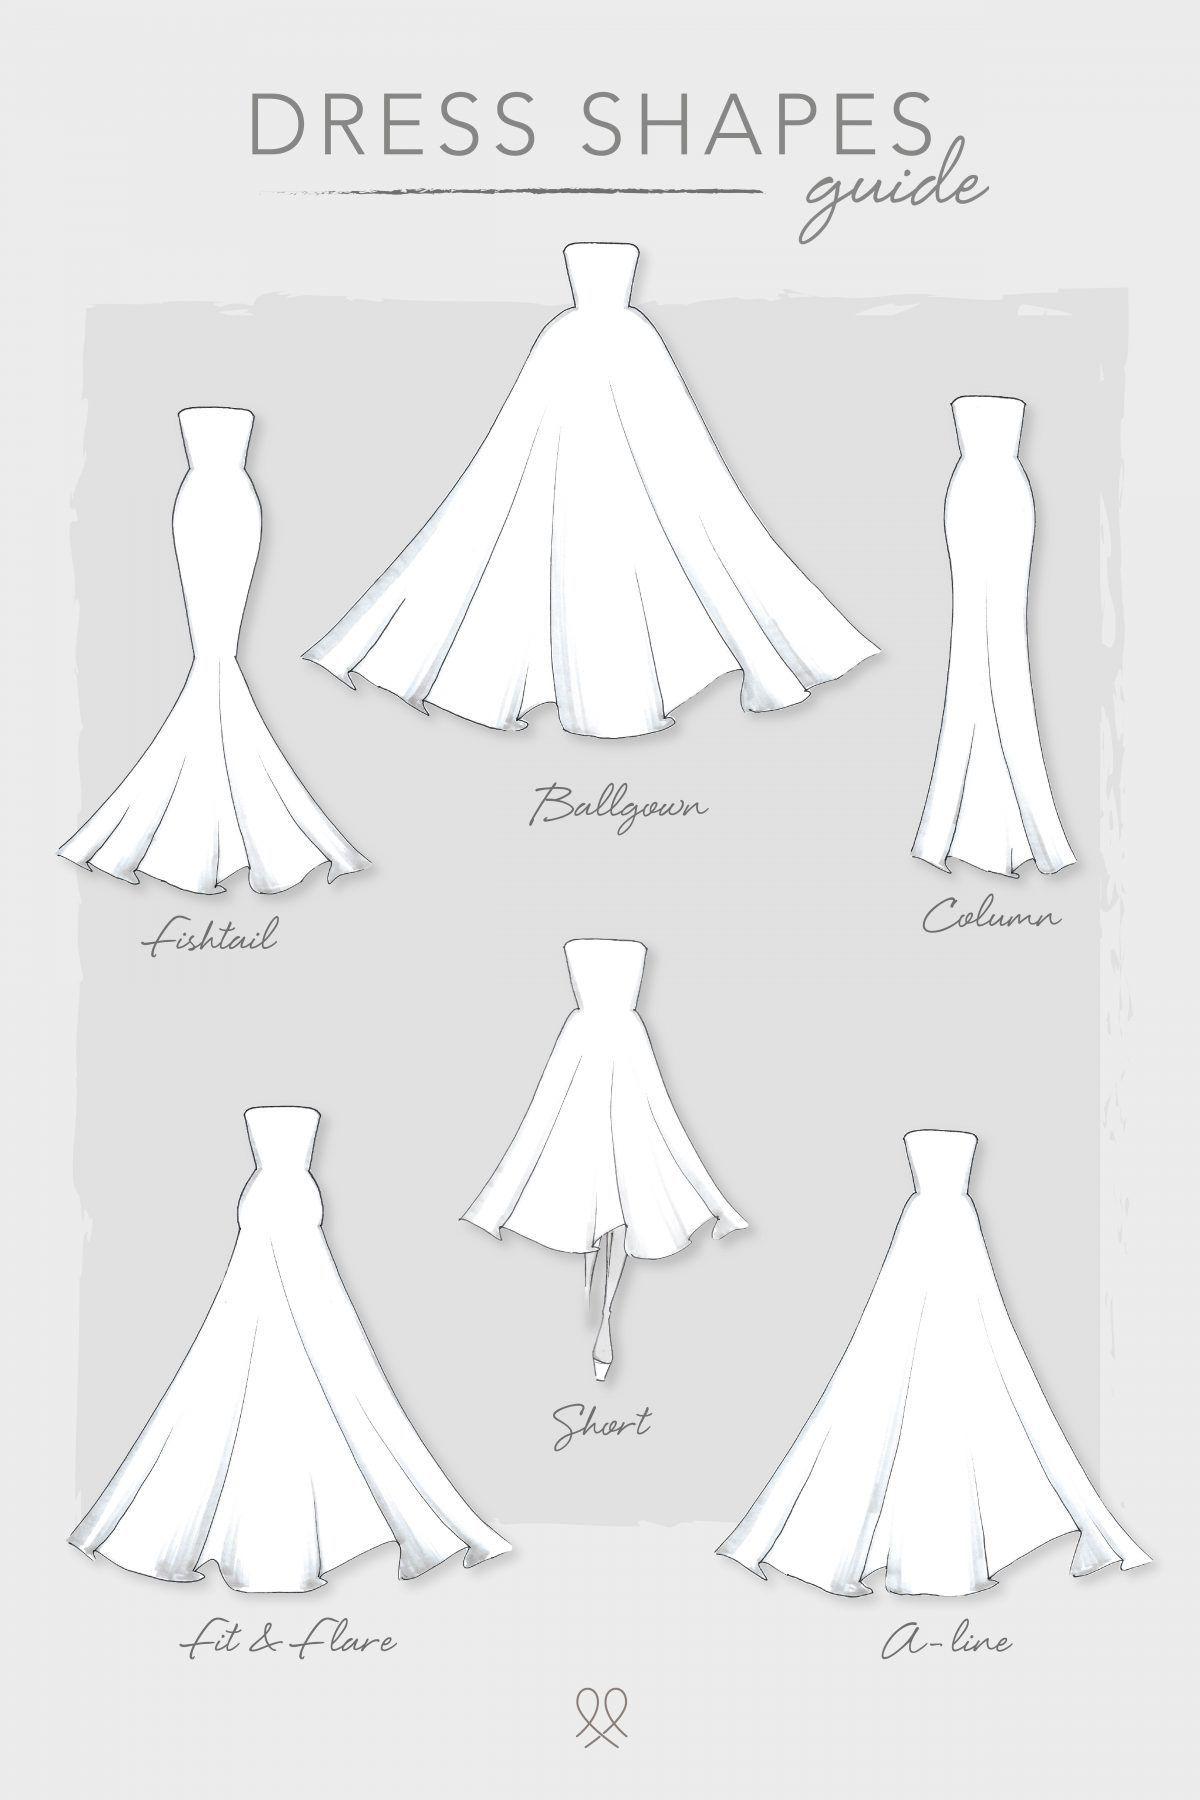 WED2B UK BLOG - WED2B UK BLOG    Our essential guide to wedding dress shapes | WED2B-UK-BLOG   - #Blog #BurberryHandbags #CasualOutfits #ChanelHandbags #ChanelTote #DesignerClothing #DesignerHandbags #DesignerShoes #FallOutfits #FashionDesigners #FashionHandbags #GucciPurses #HermesBags #HermesHandbags #JordanCarver #LouisVuitton #LouisVuittonHandbags #LvHandbags #NikeFreeShoes #PradaHandbags #WED2B #WeddingSarees